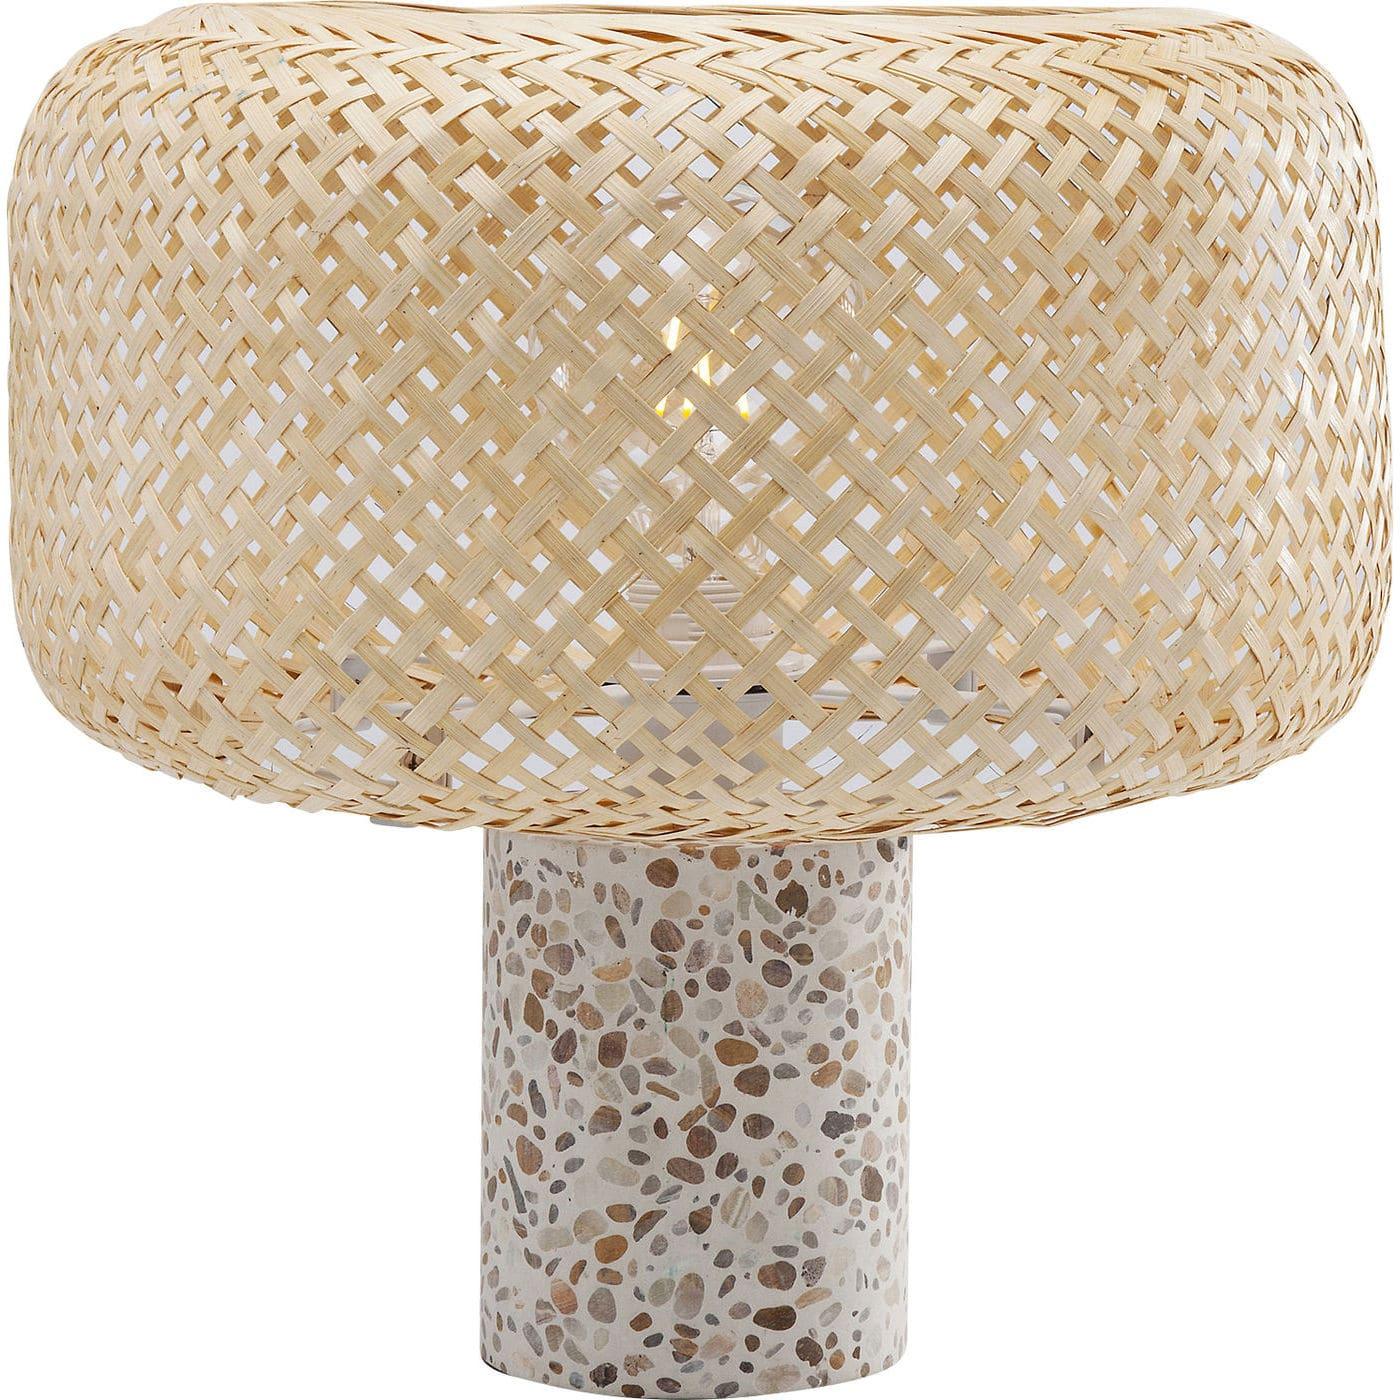 Kare design terrazzo nature bordlampe - multifarvet beton/natur rattan